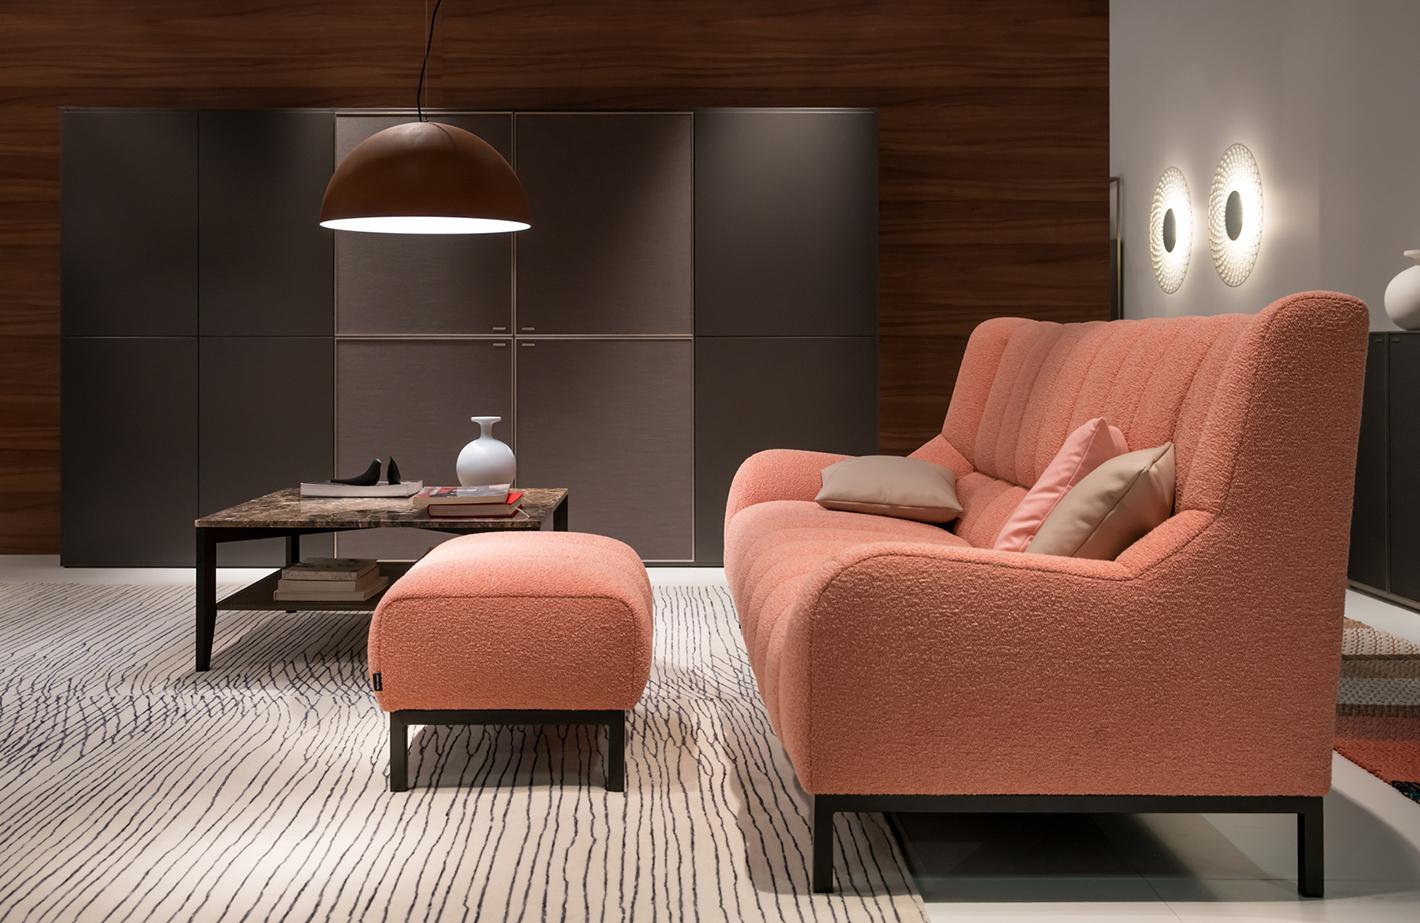 polsterharmonie phileas von philippe nigro f r ligne. Black Bedroom Furniture Sets. Home Design Ideas